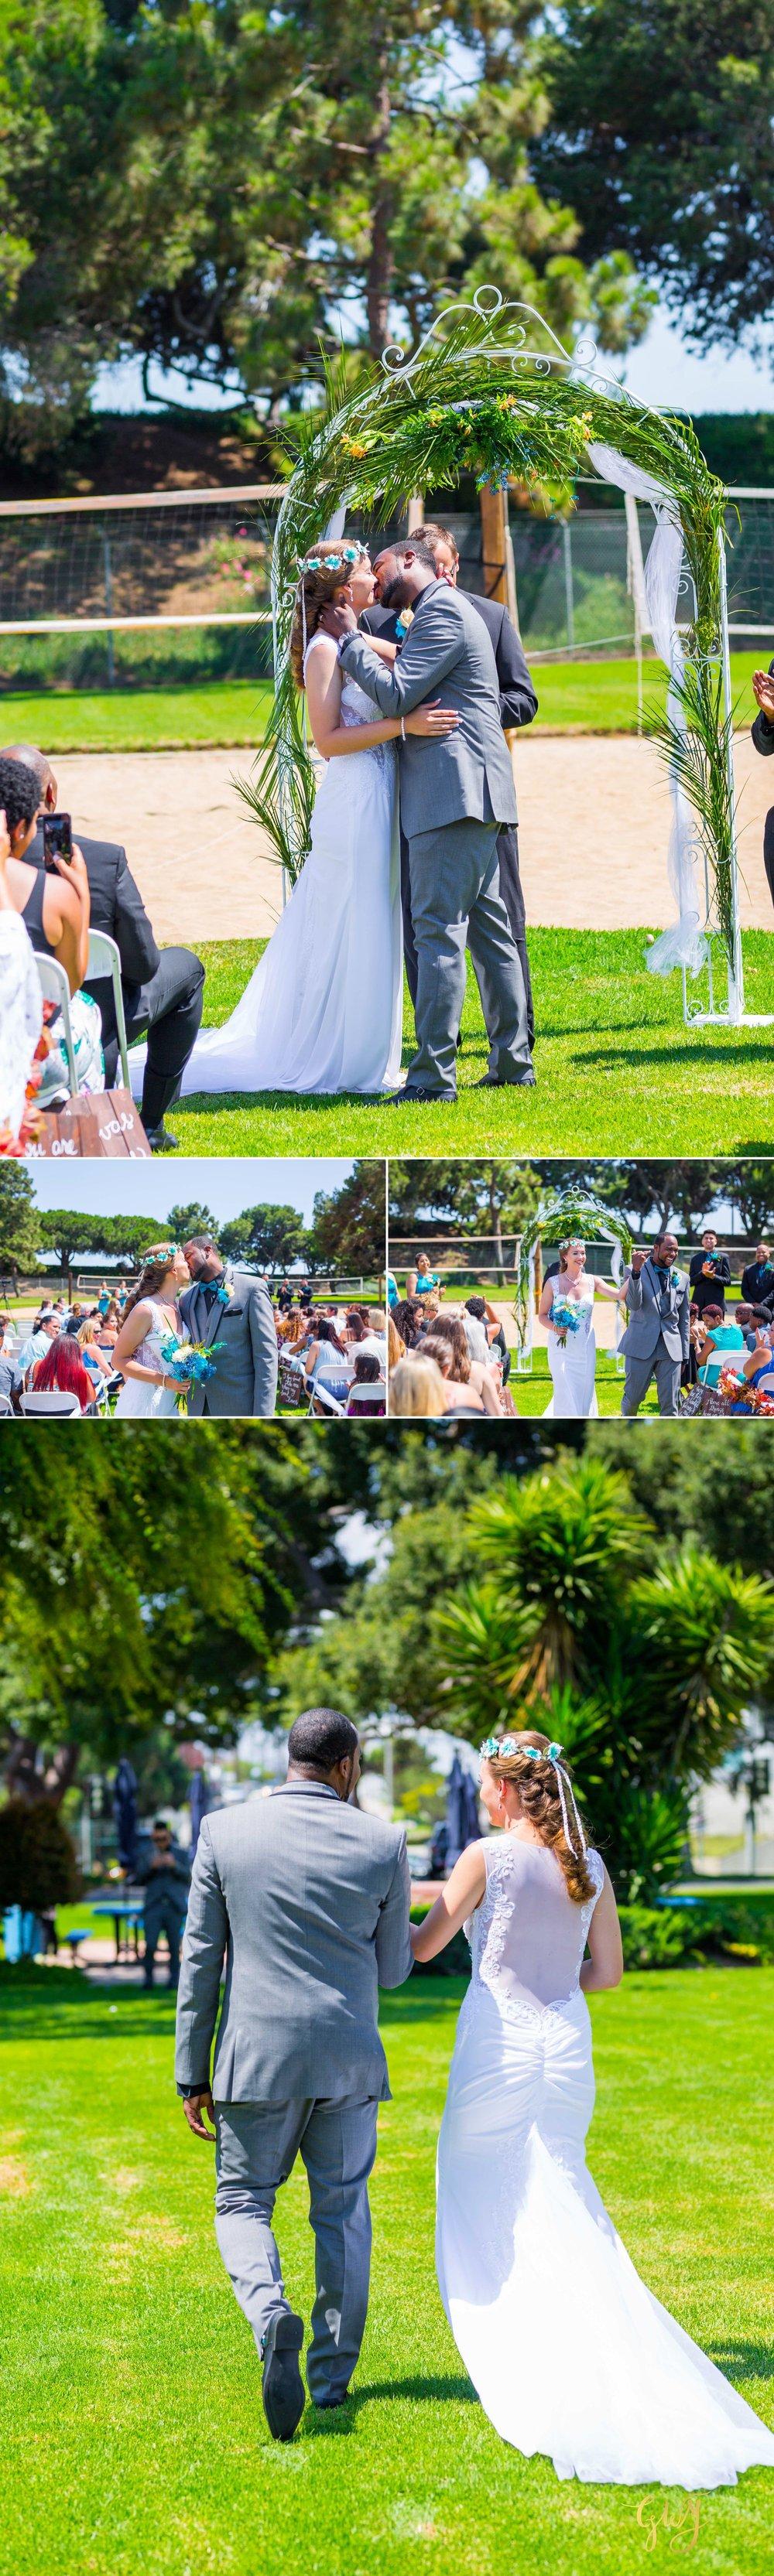 Rebecca + Torand El Segundo Chevron Employee Park Summer Barbados Bajan Wedding by Glass Woods Media 4.jpg